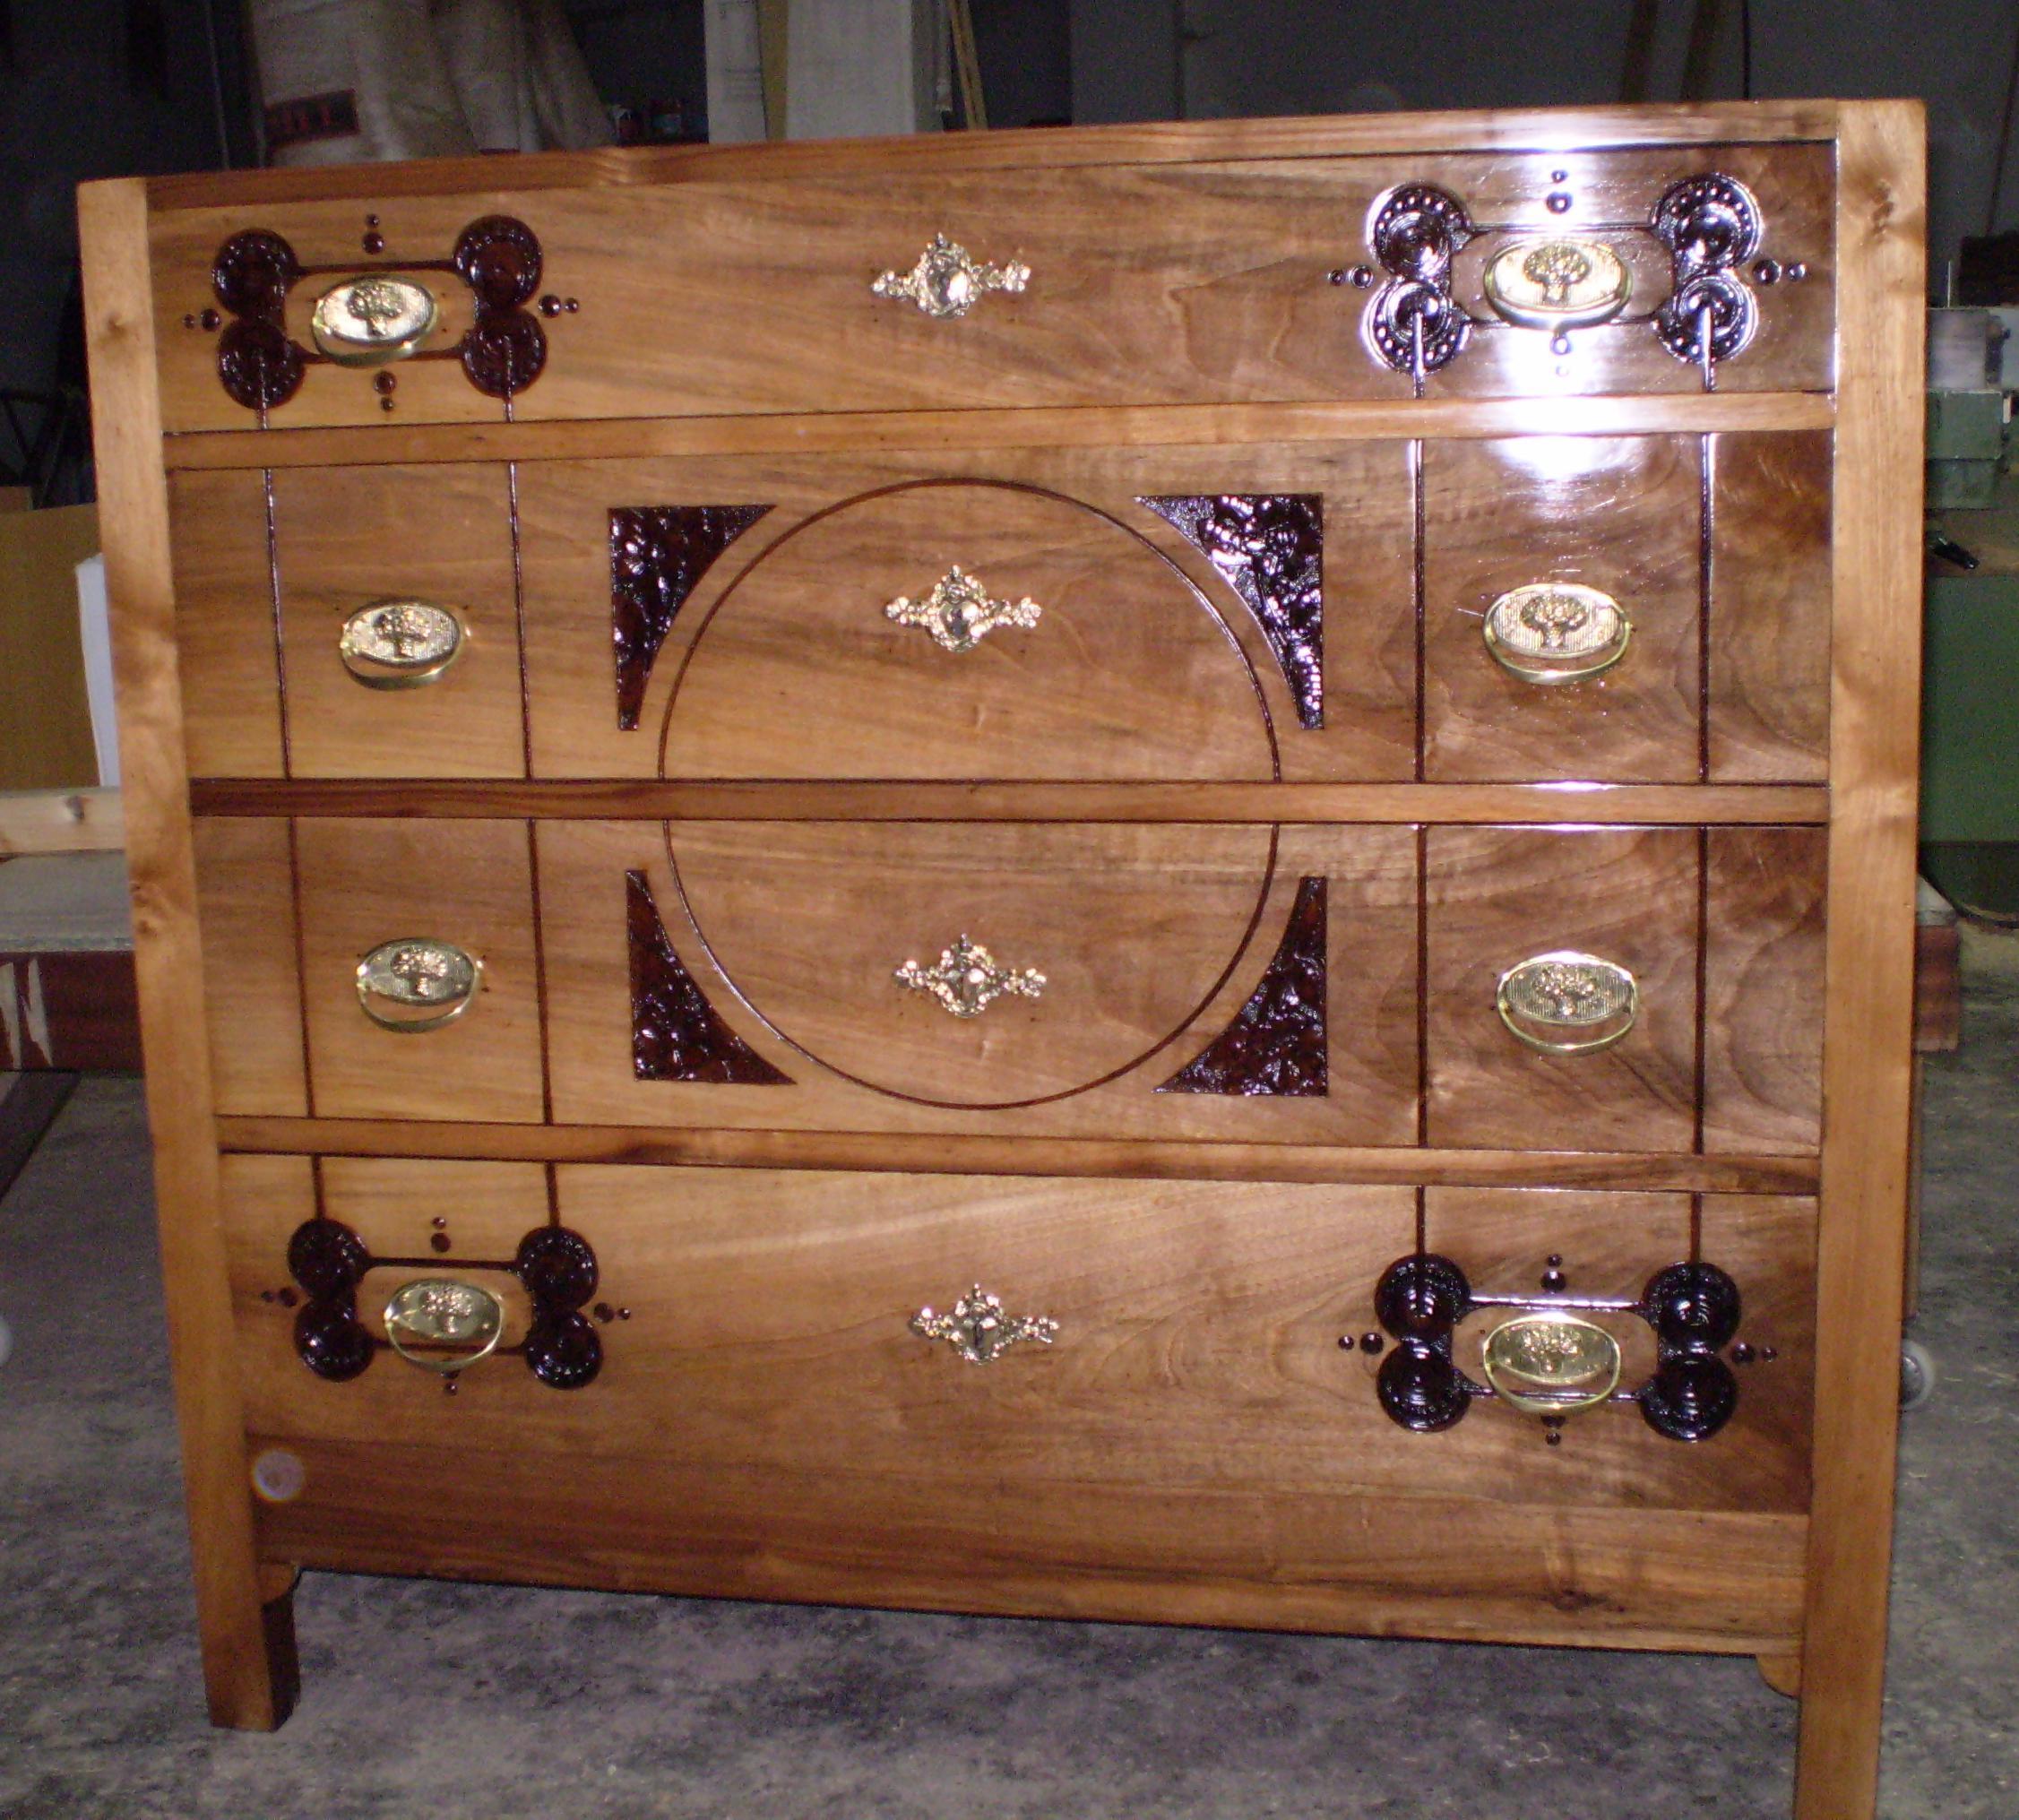 Restaurar muebles antiguos de madera beautiful decorar for Restaurar muebles de madera viejos